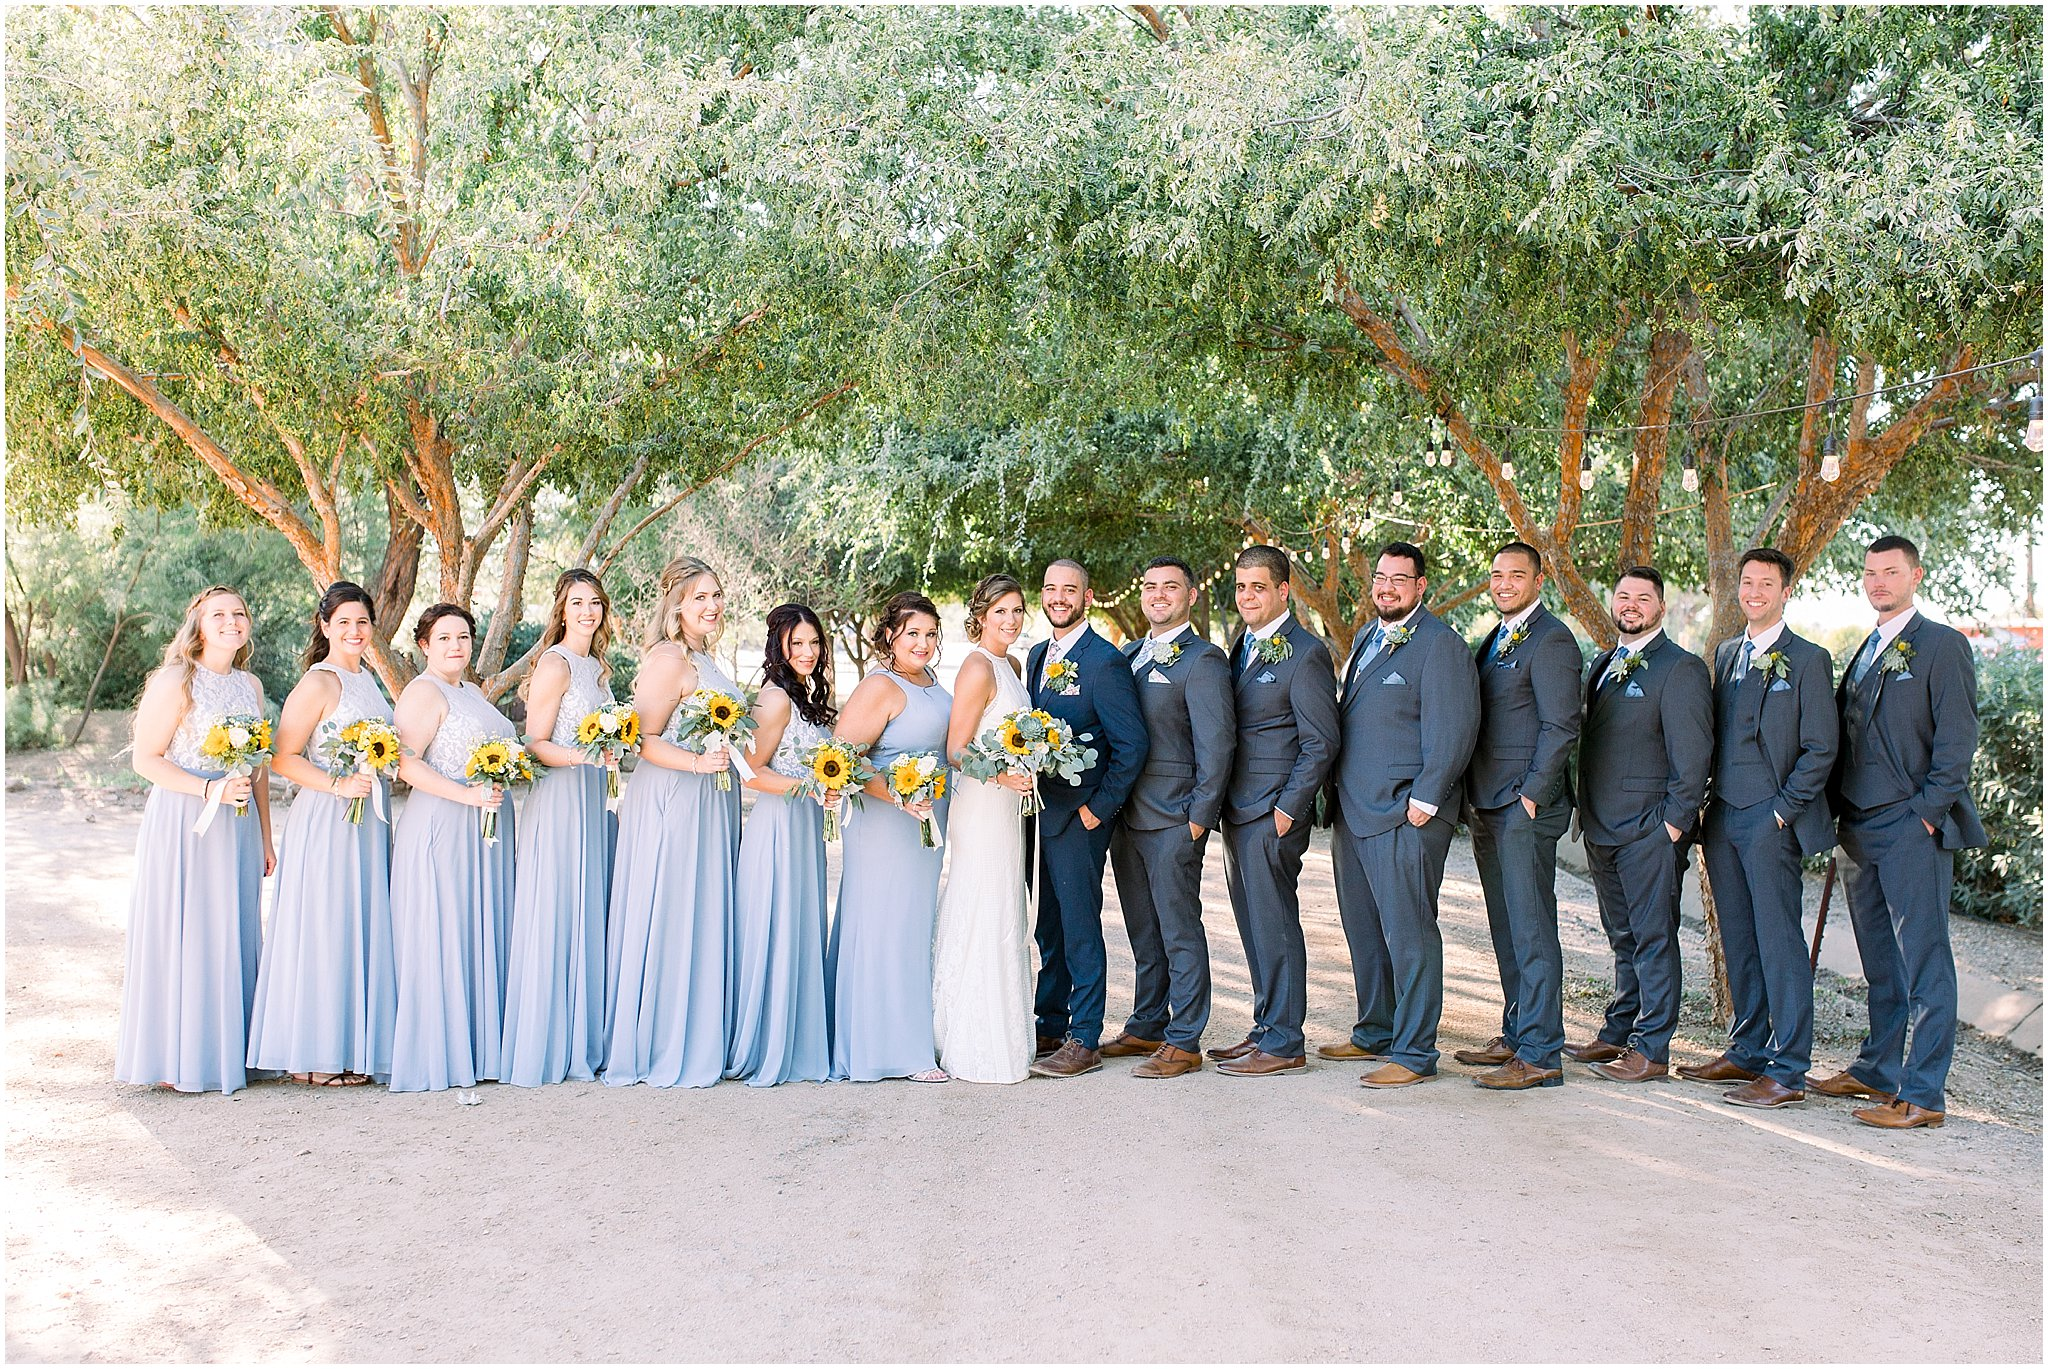 Hyatt-Lodge-Mcdonald-Campus-Wedding_0113.jpg